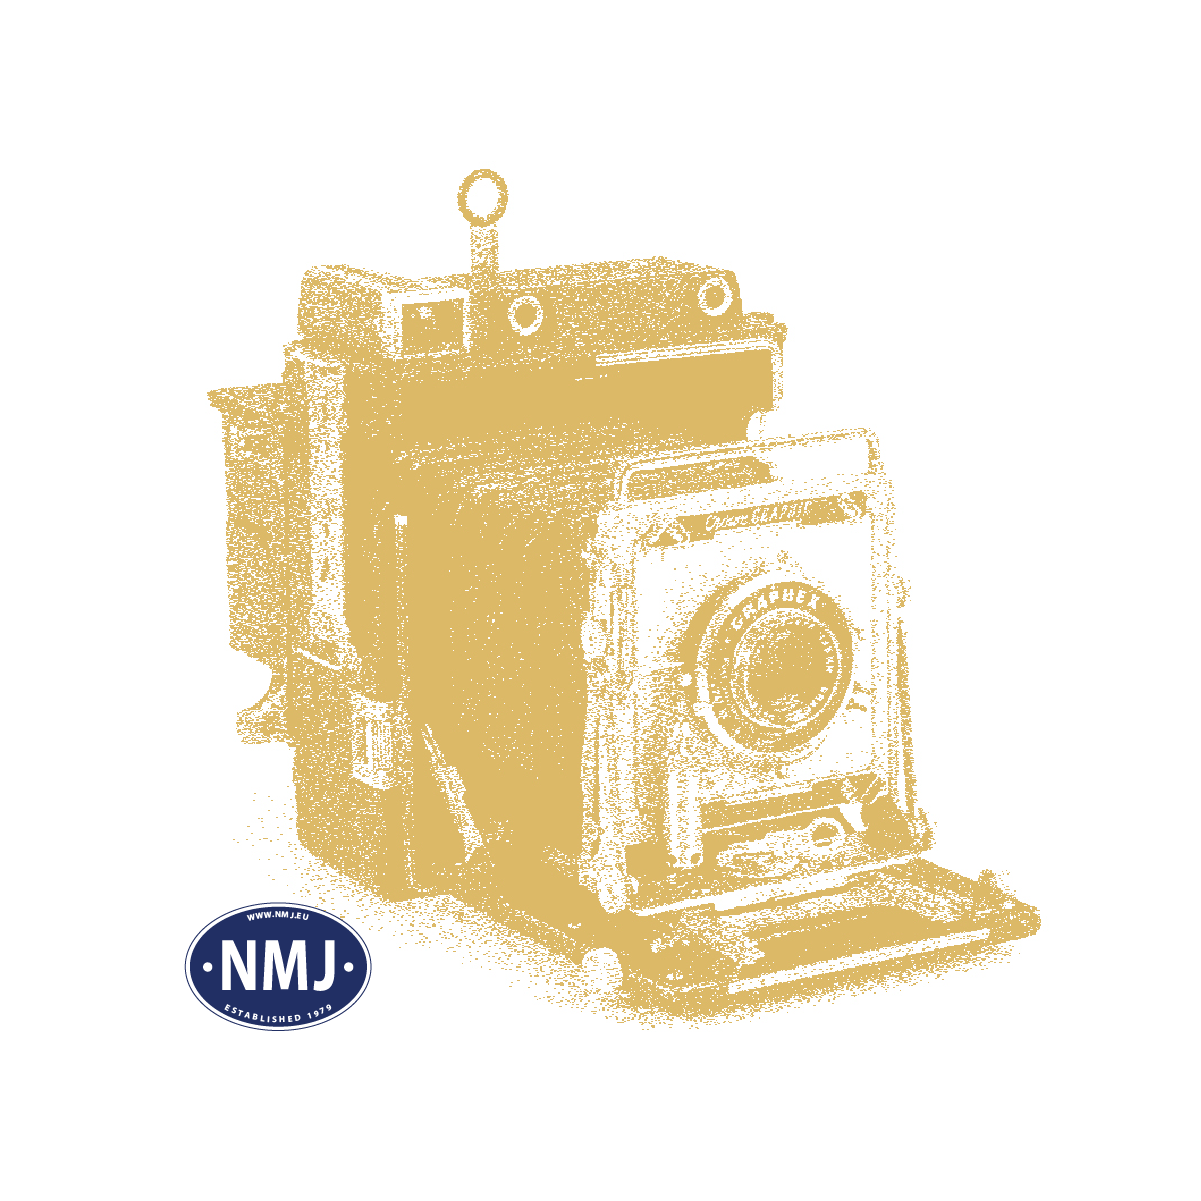 NMJT120.991 - NMJ Topline NSB B7 Radstromabnahmekontakte, 10 Stk